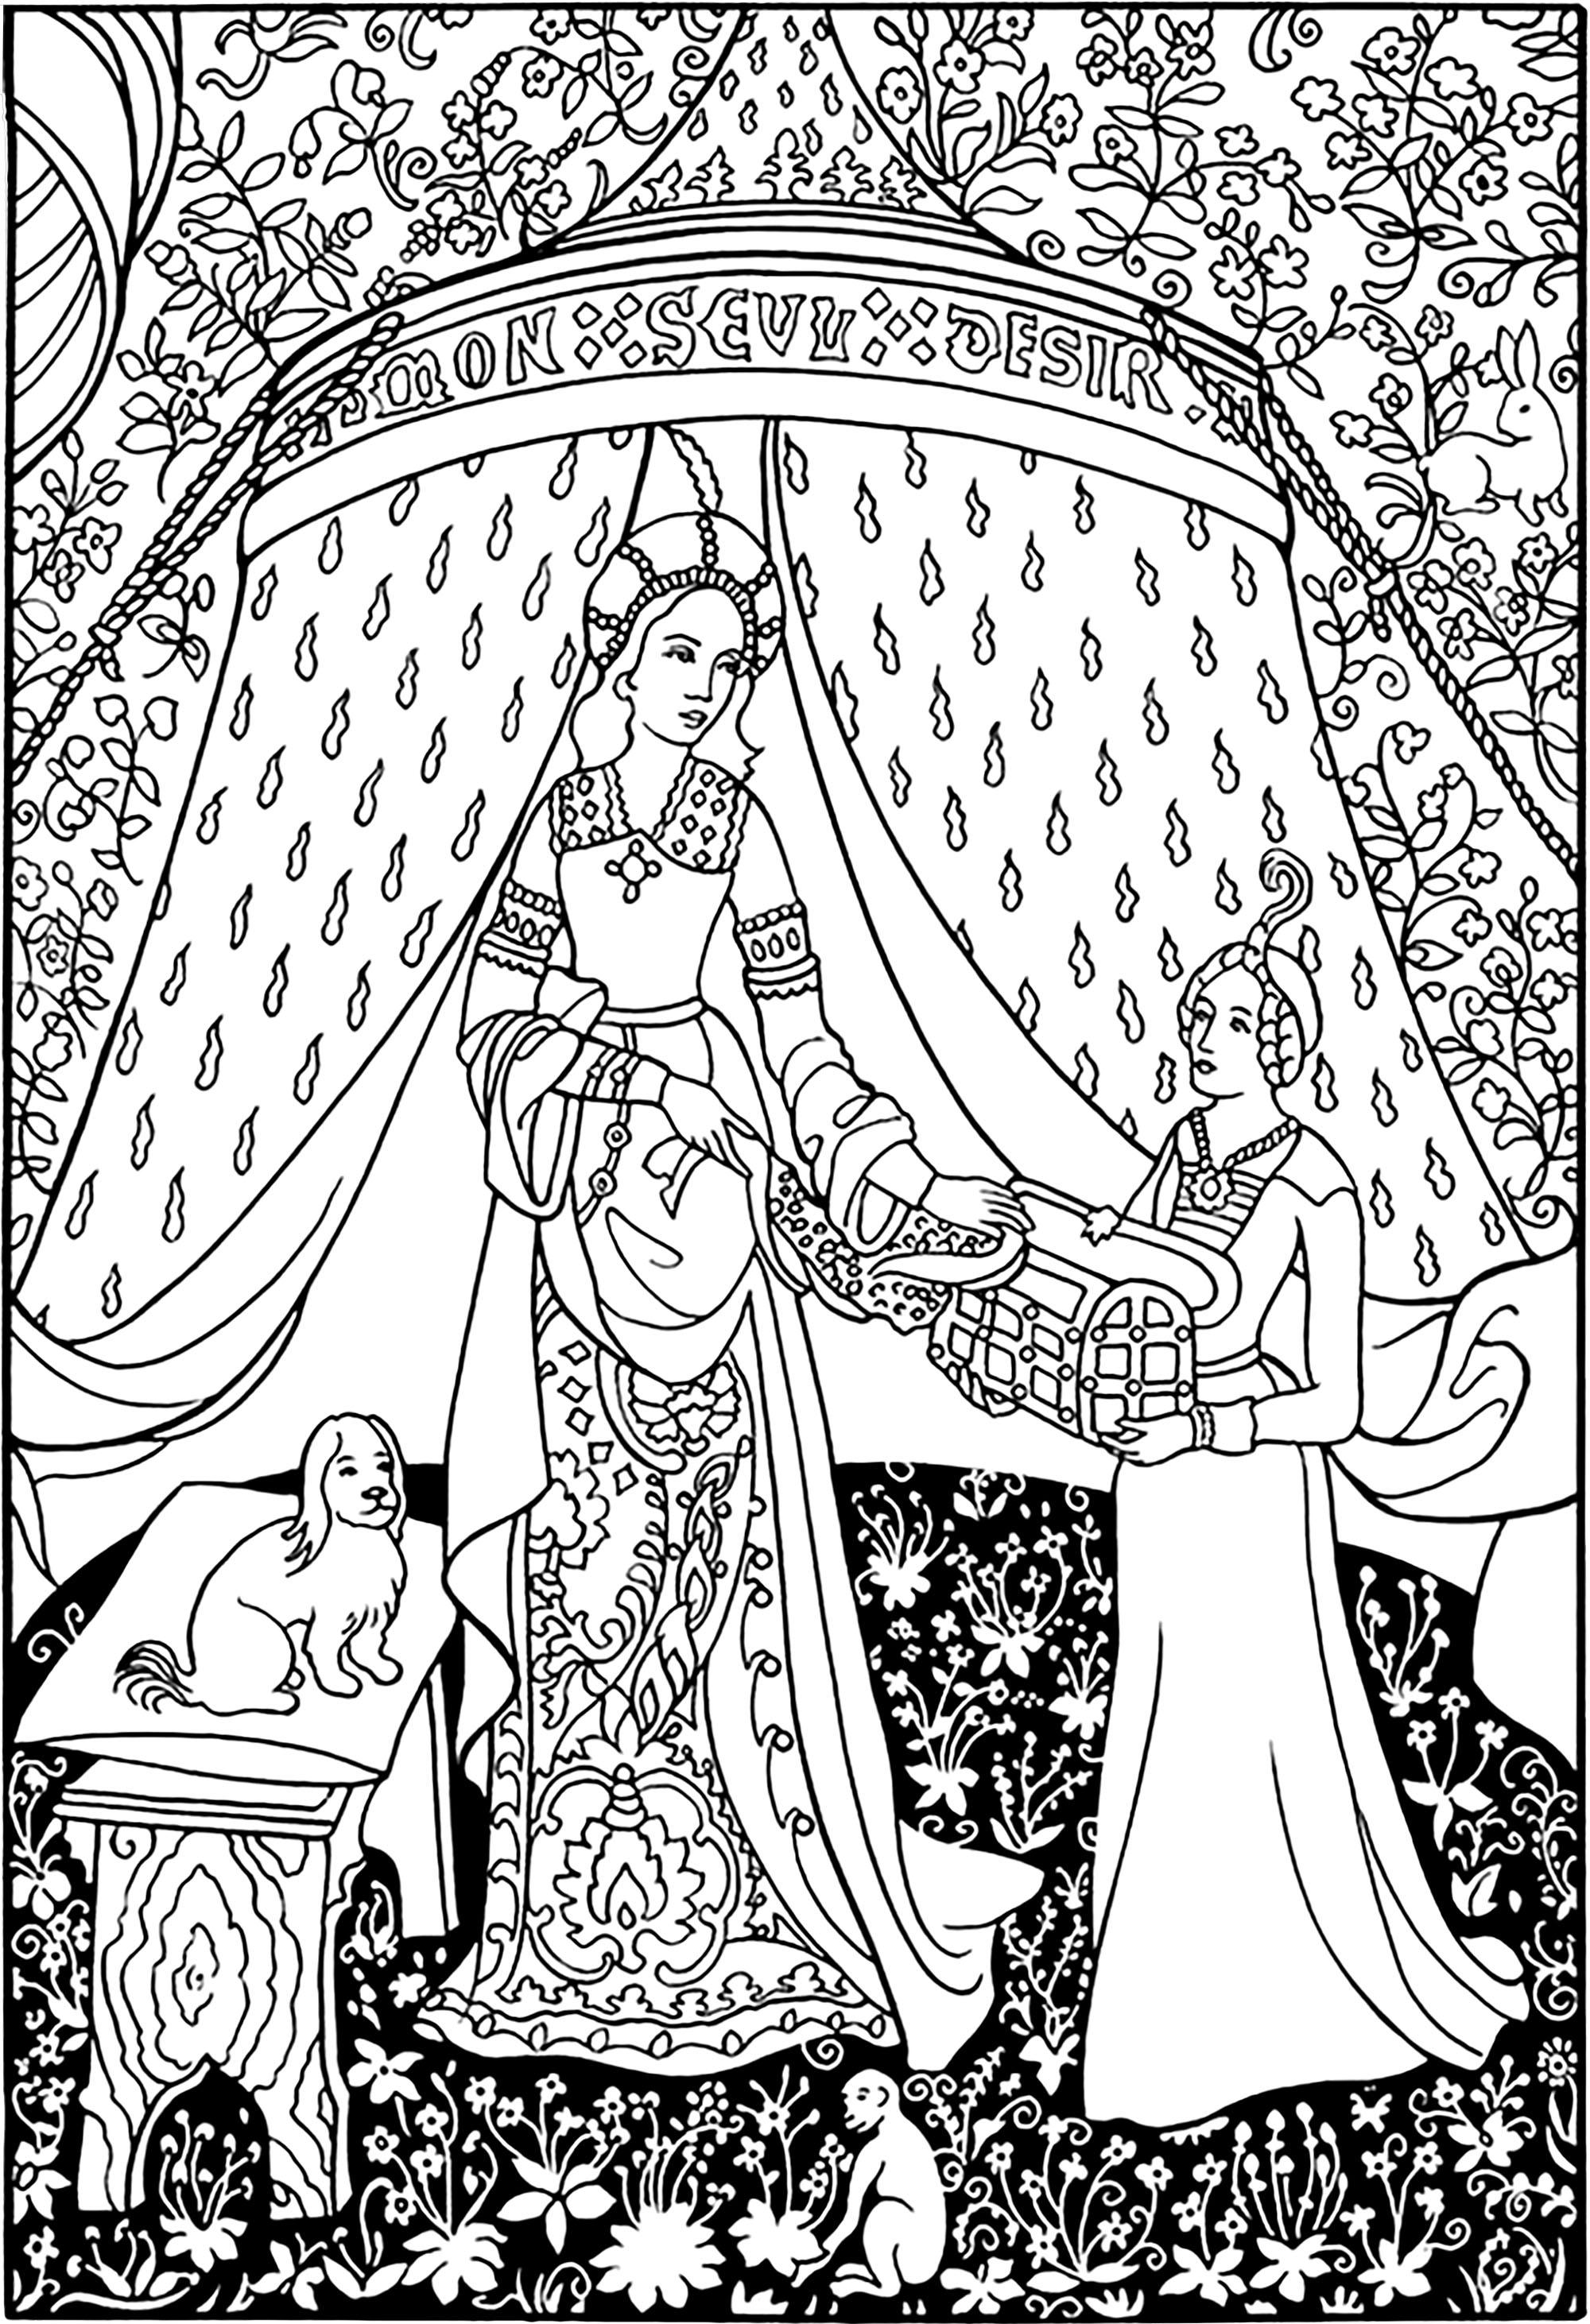 Tapisserie la dame la licorne moyen ge coloriages difficiles pour adultes - Tapisserie dame a la licorne ...